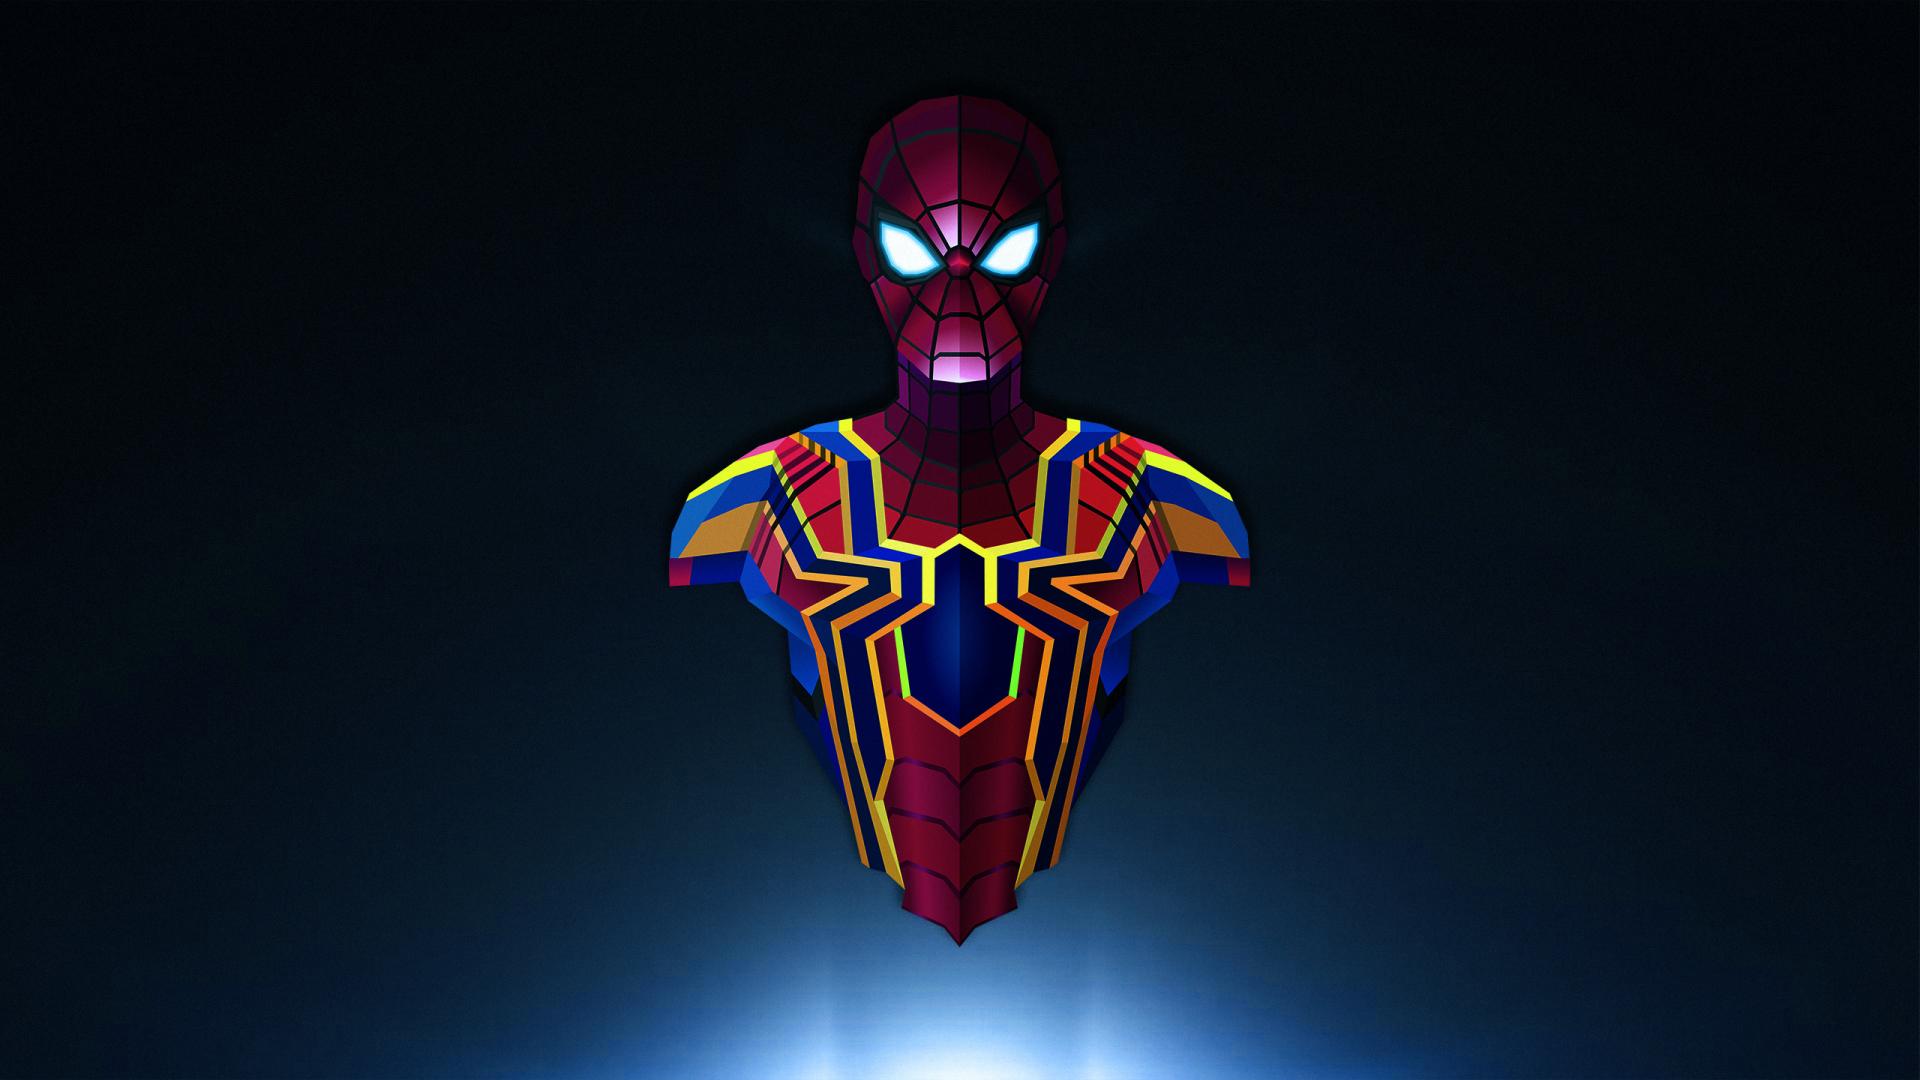 Download 1920x1080 Wallpaper Spider Man Avengers Infinity